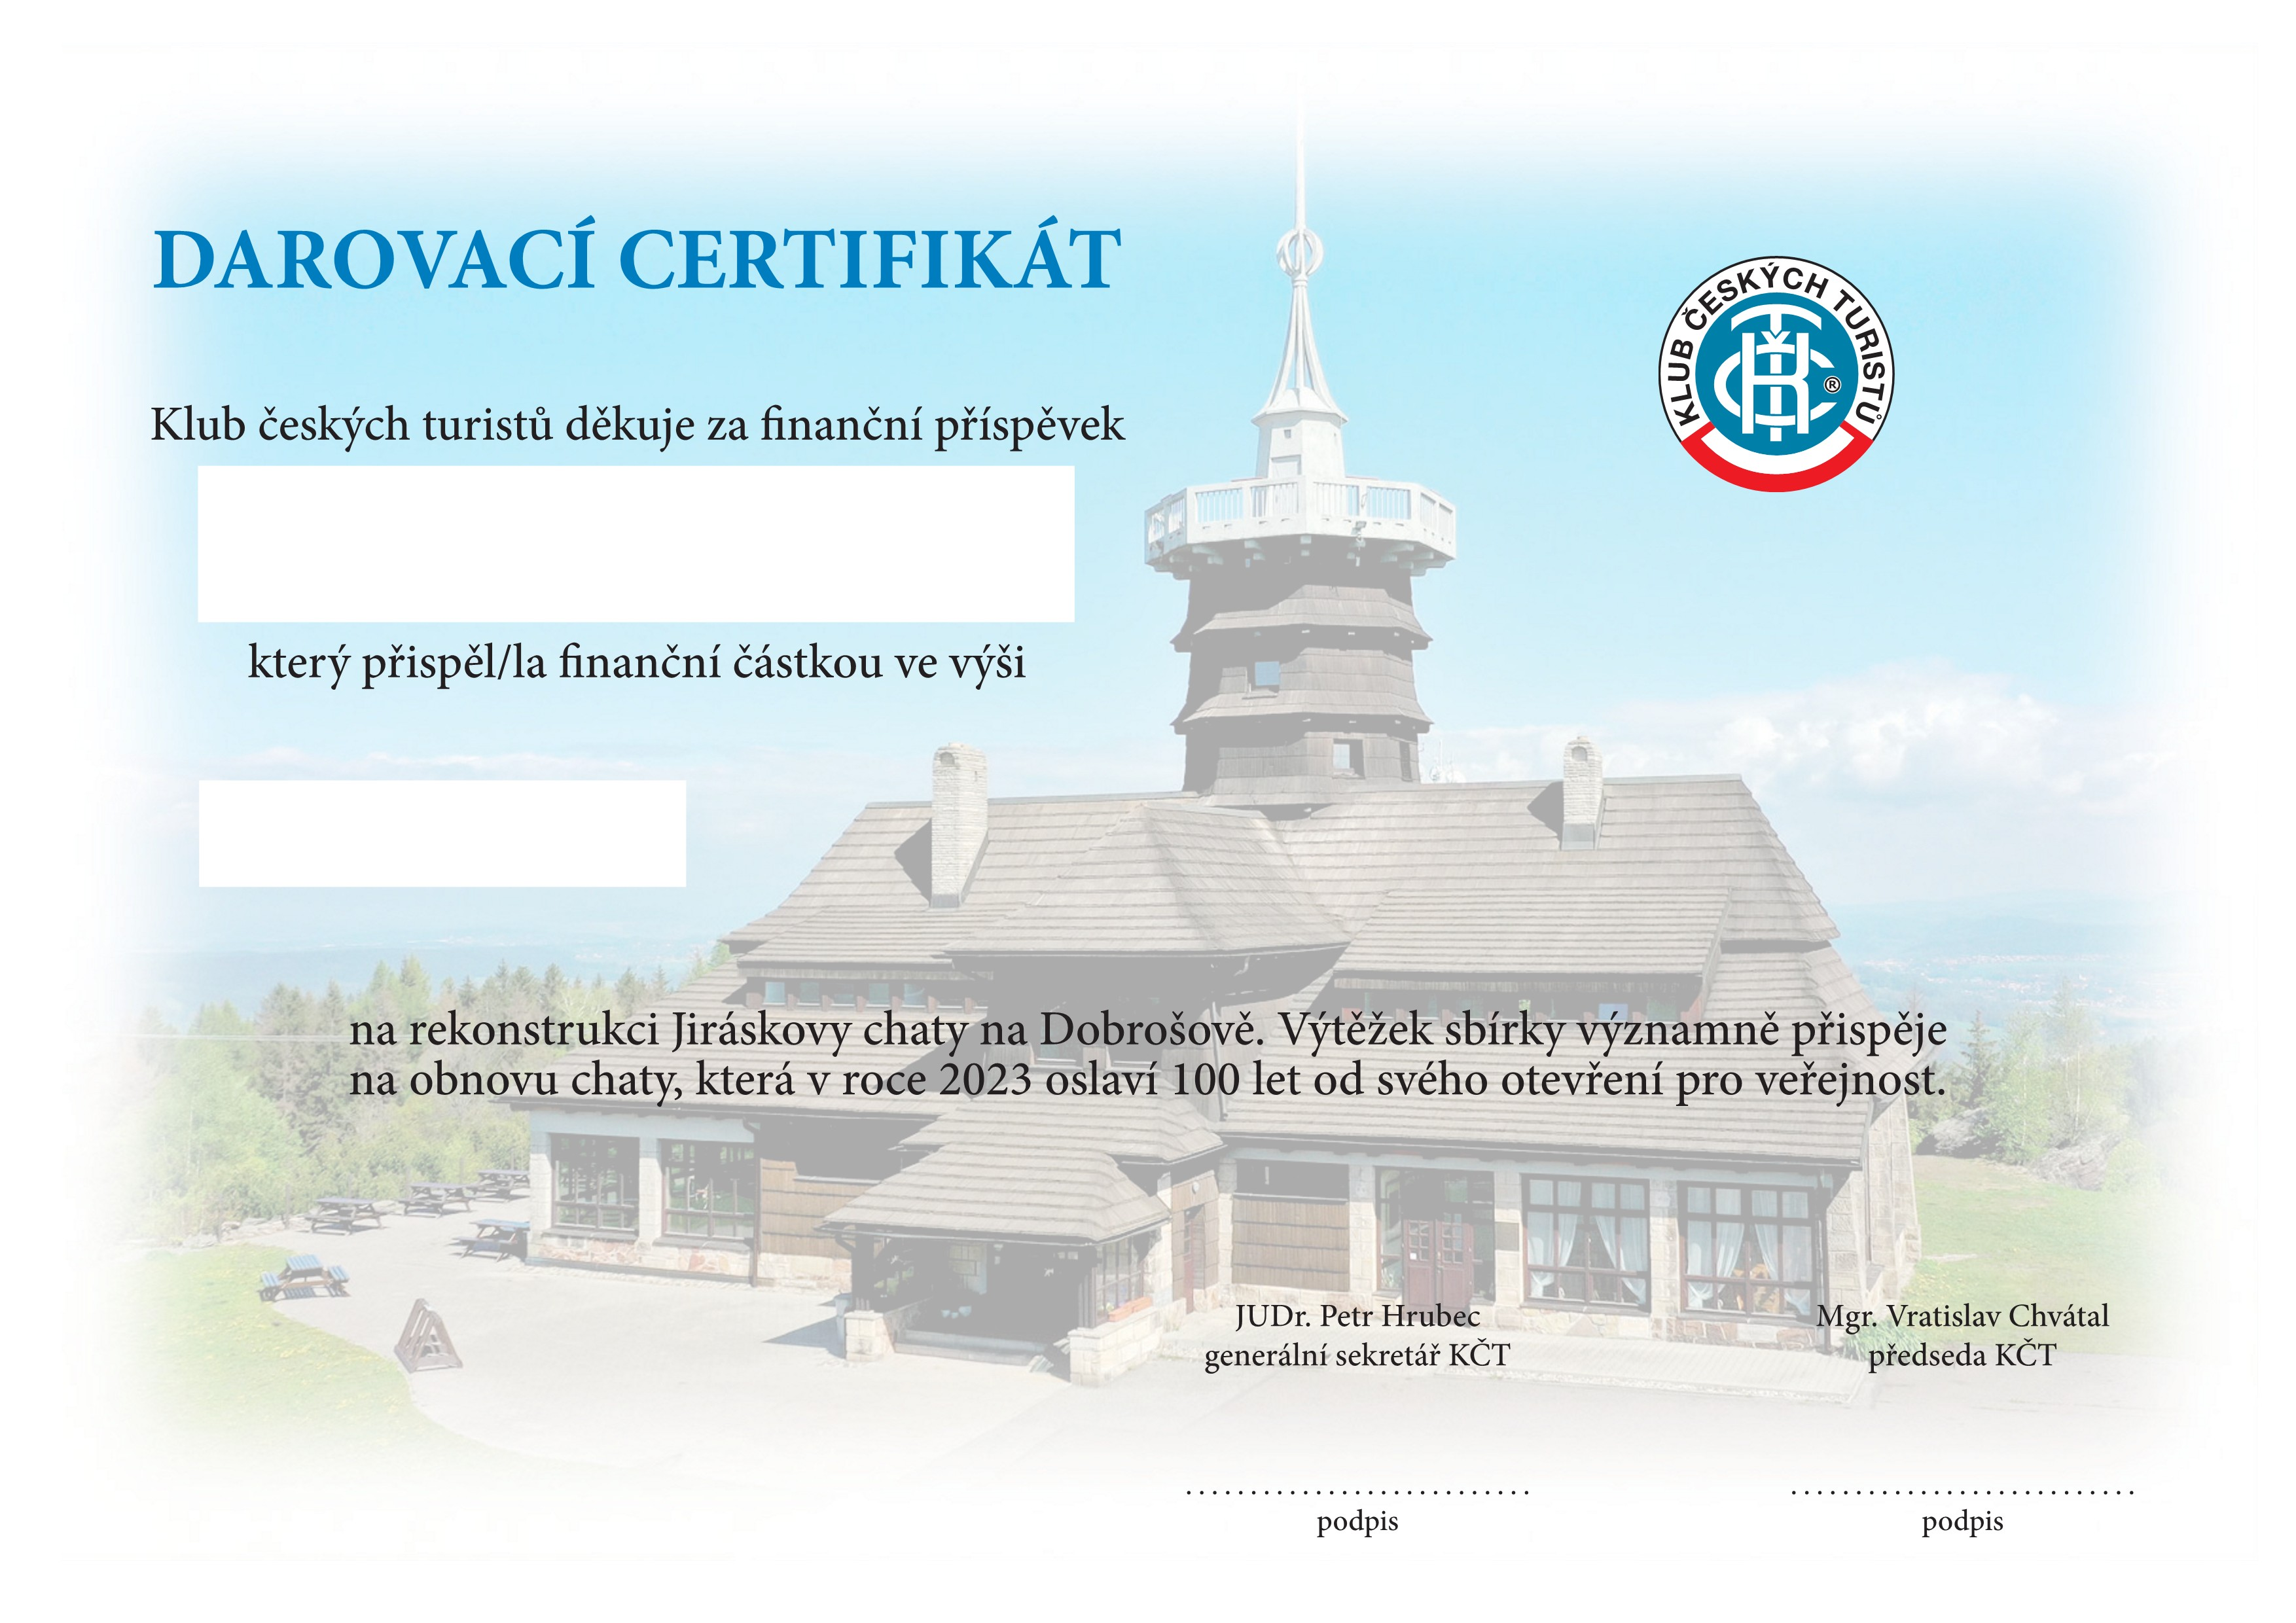 DAROVACI+CERTIFIKAT+JIRASKOVA+CHATA.pdf